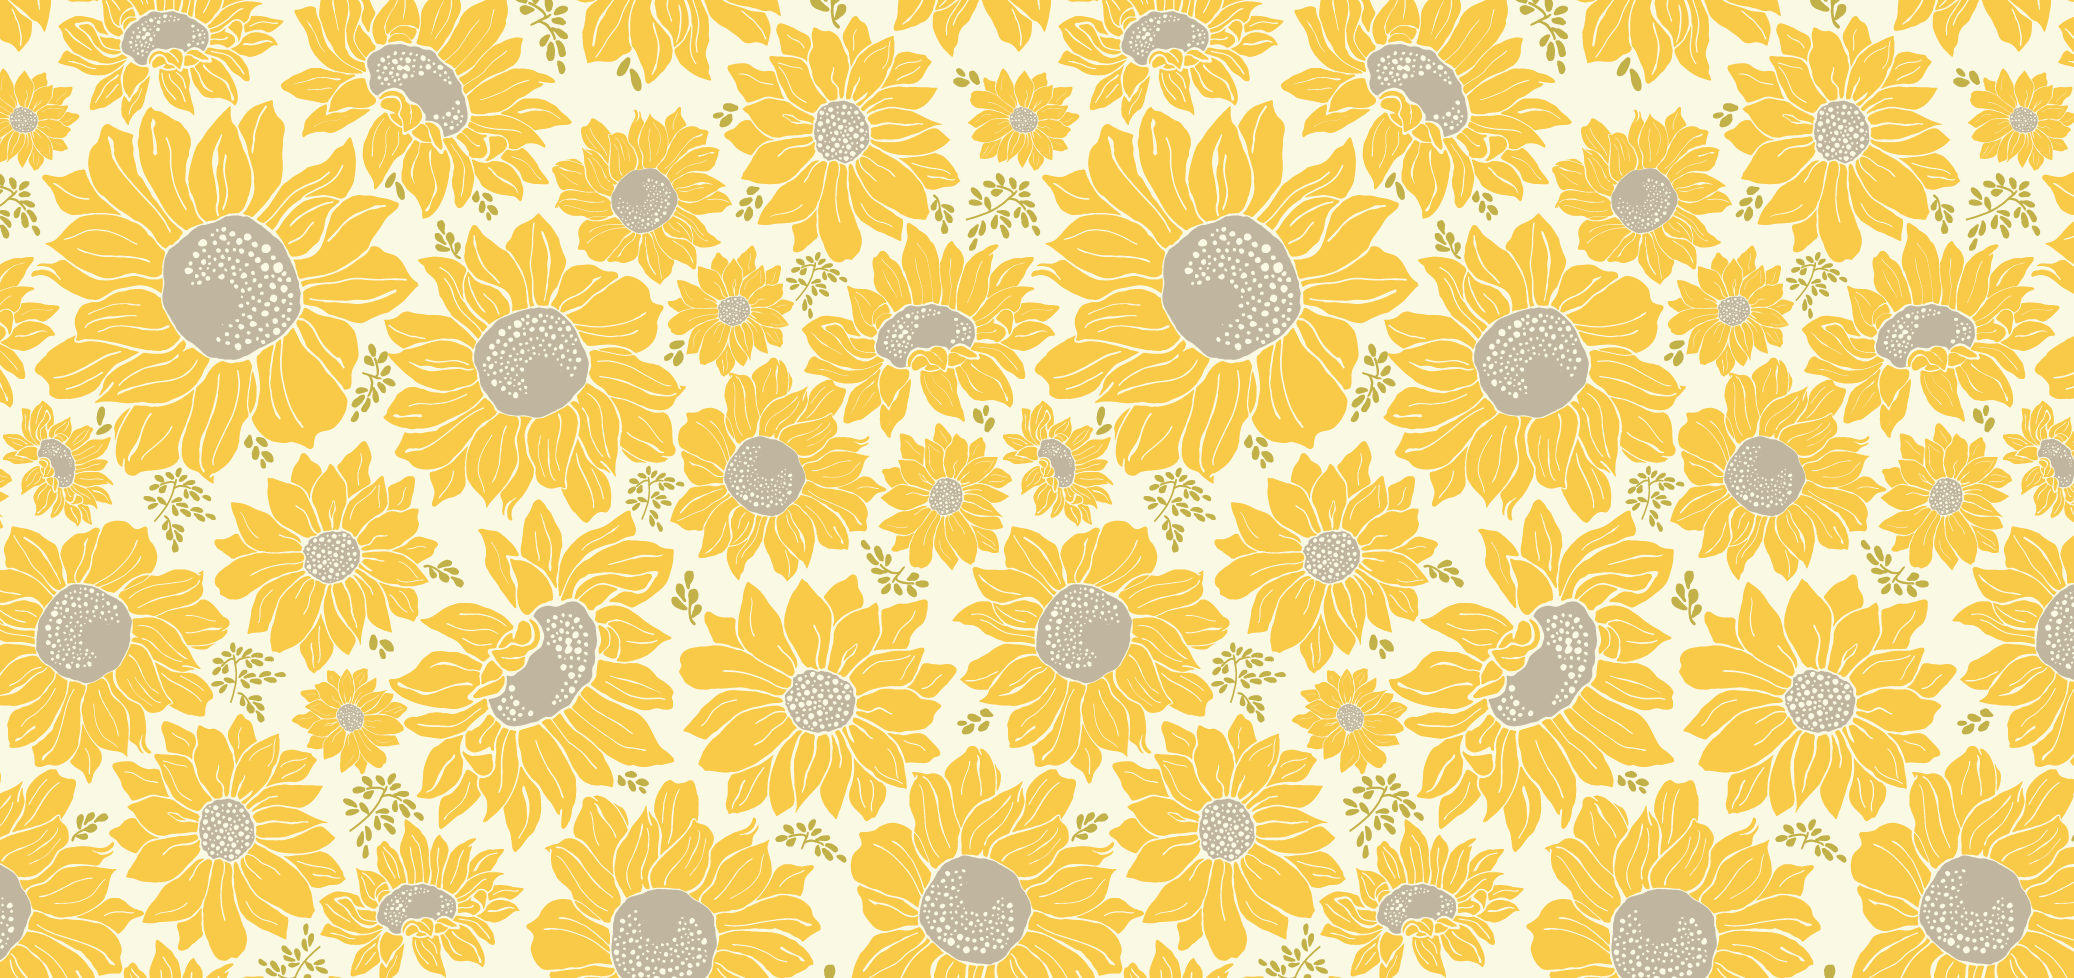 elena-wilken-walk-in-the-countryside-surface-pattern-design1.png